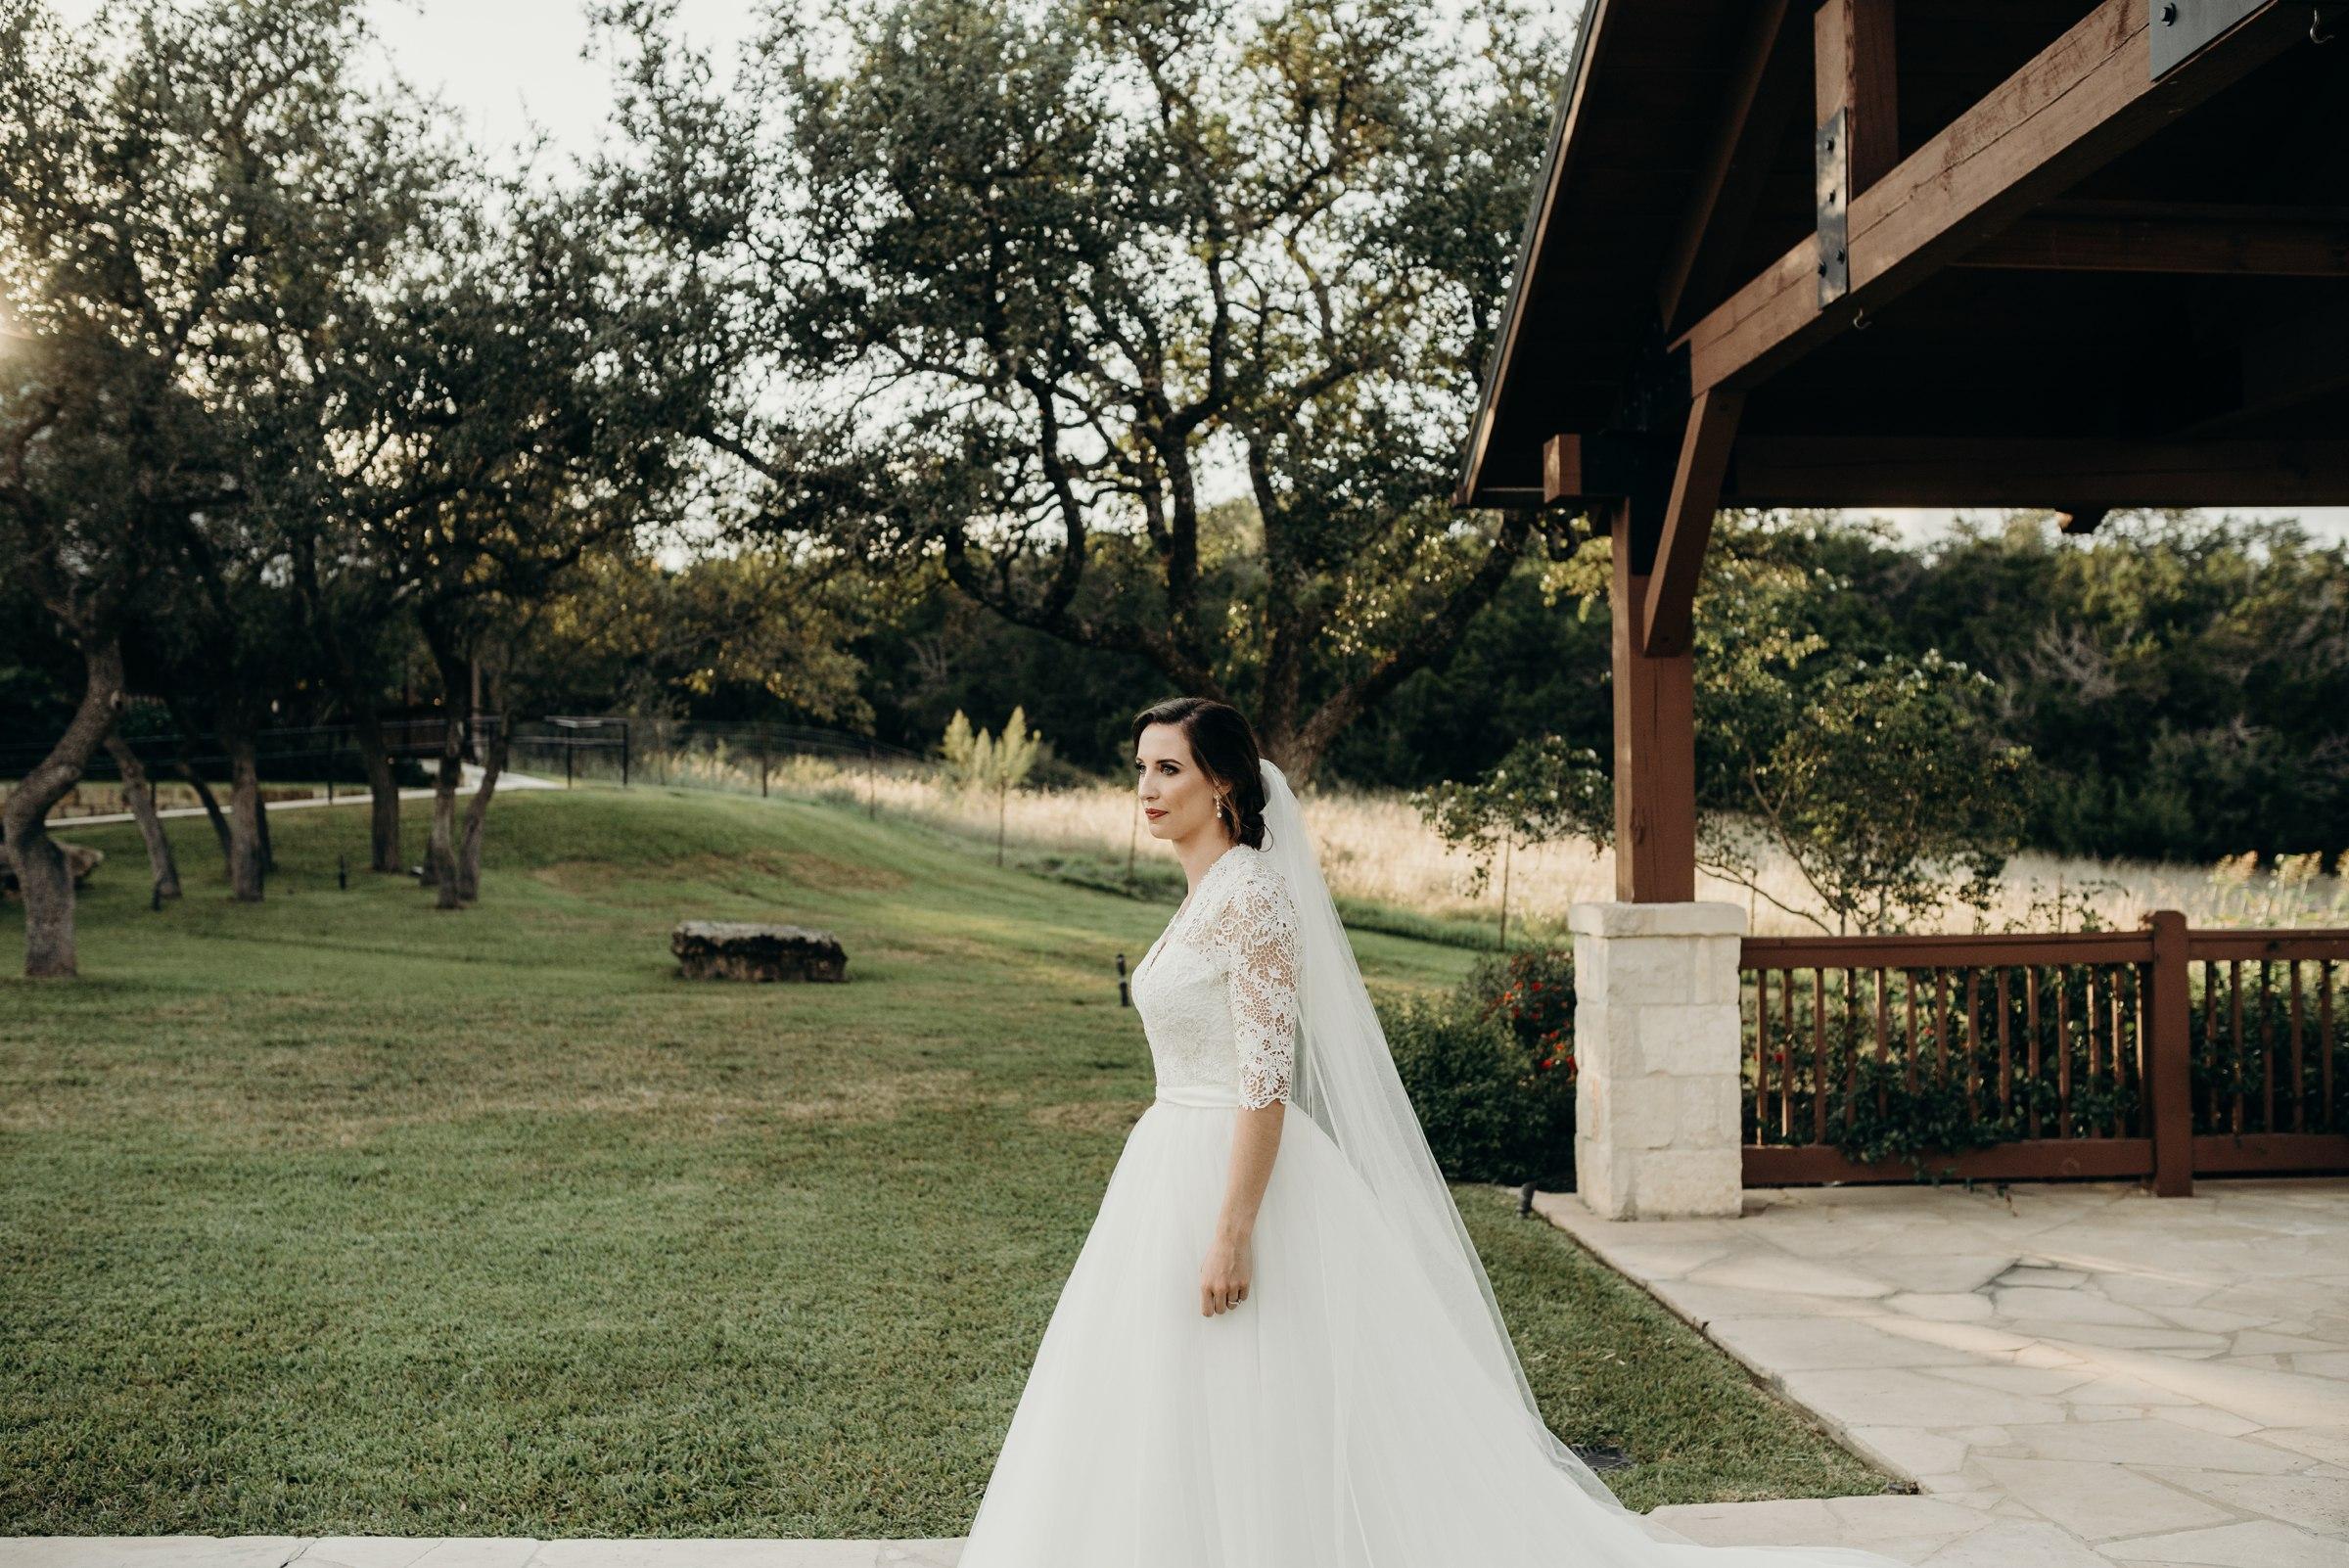 austin-minneapolis-wedding-engagement-elopement-bridals-prices-best-senior-photographer-destination-elopement-milestone-texas-dallas-houston-lexi_0030.jpg